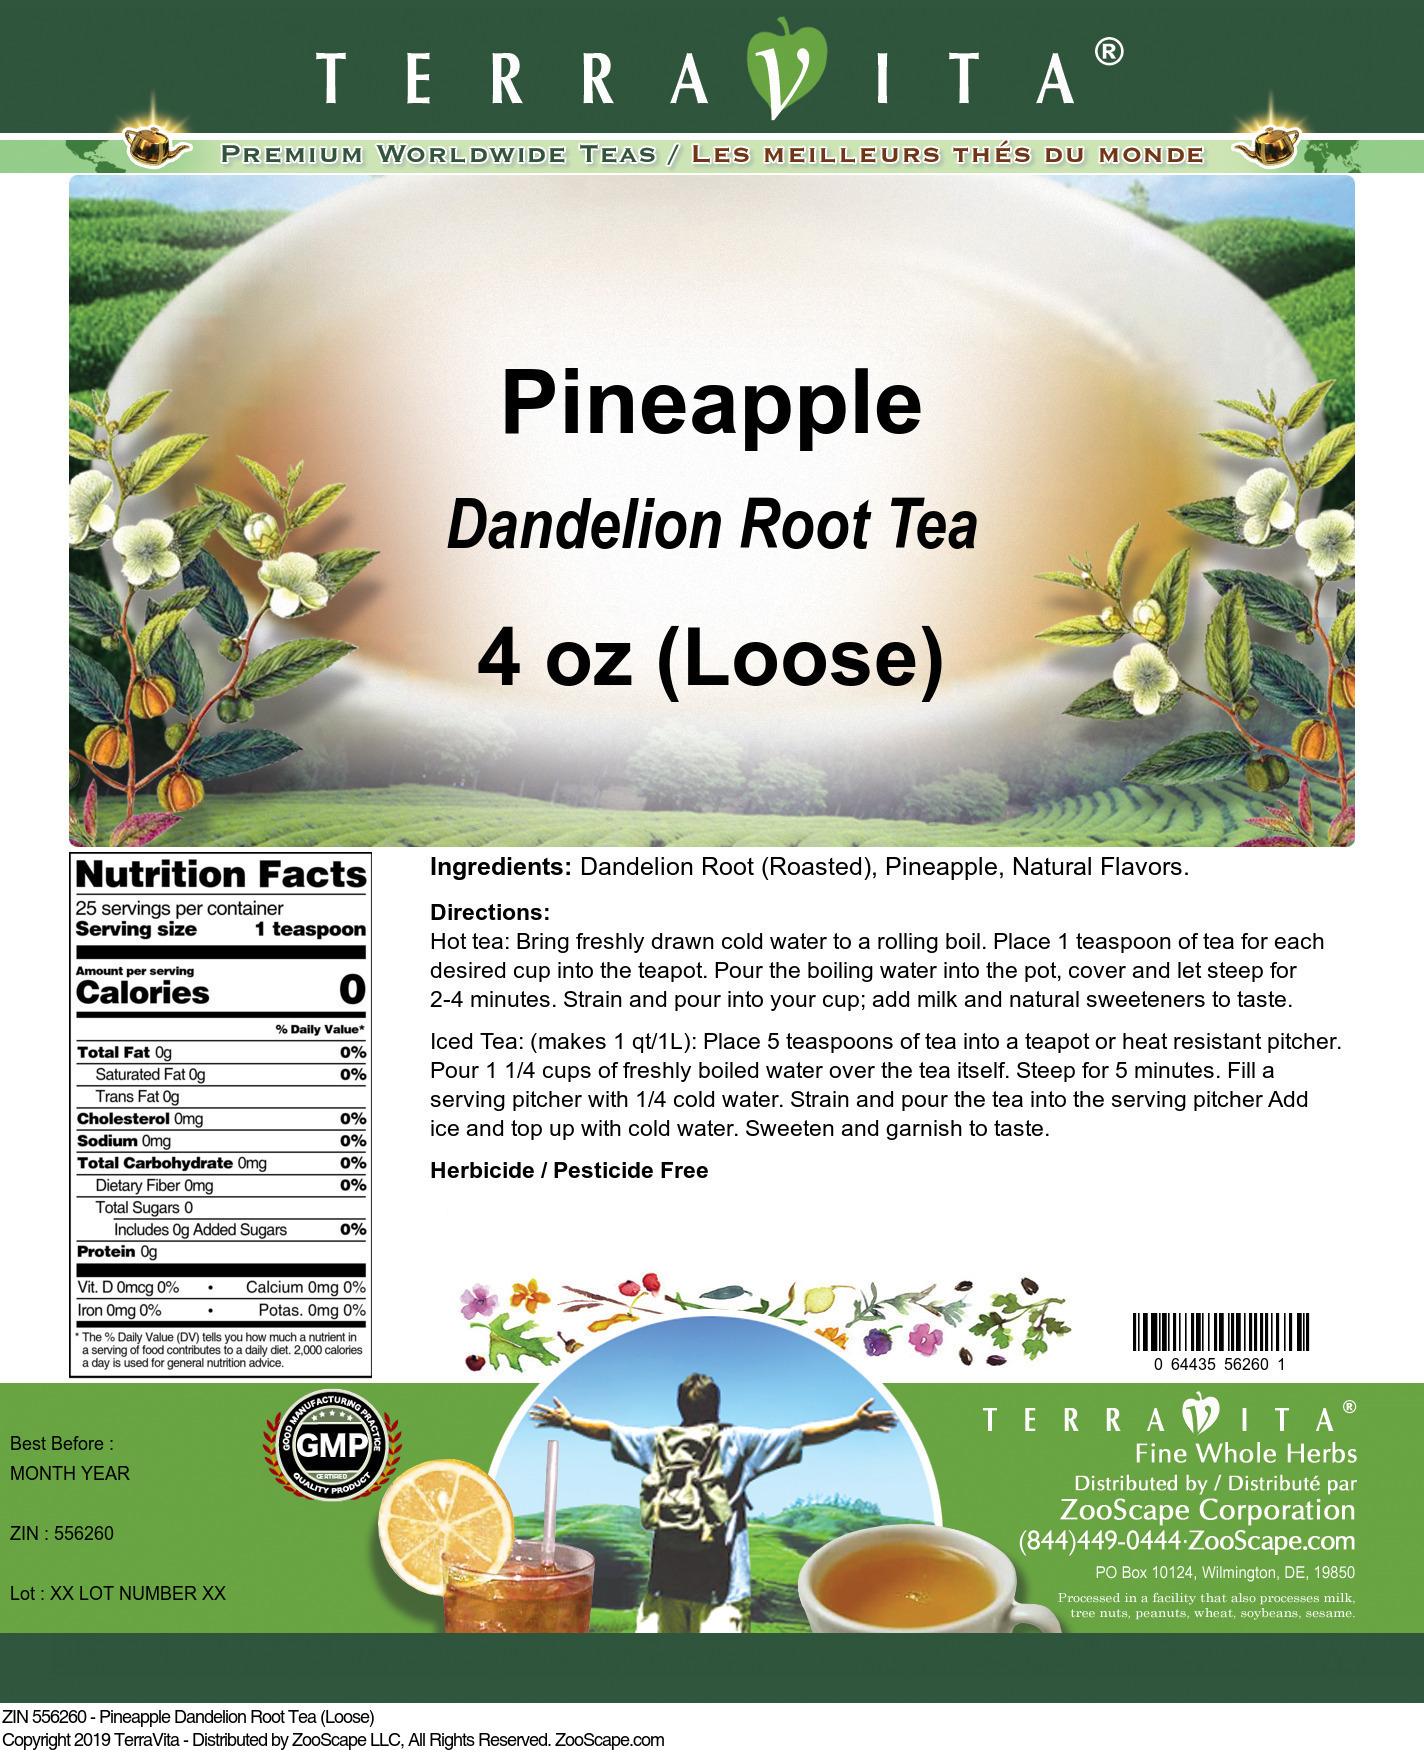 Pineapple Dandelion Root Tea (Loose)